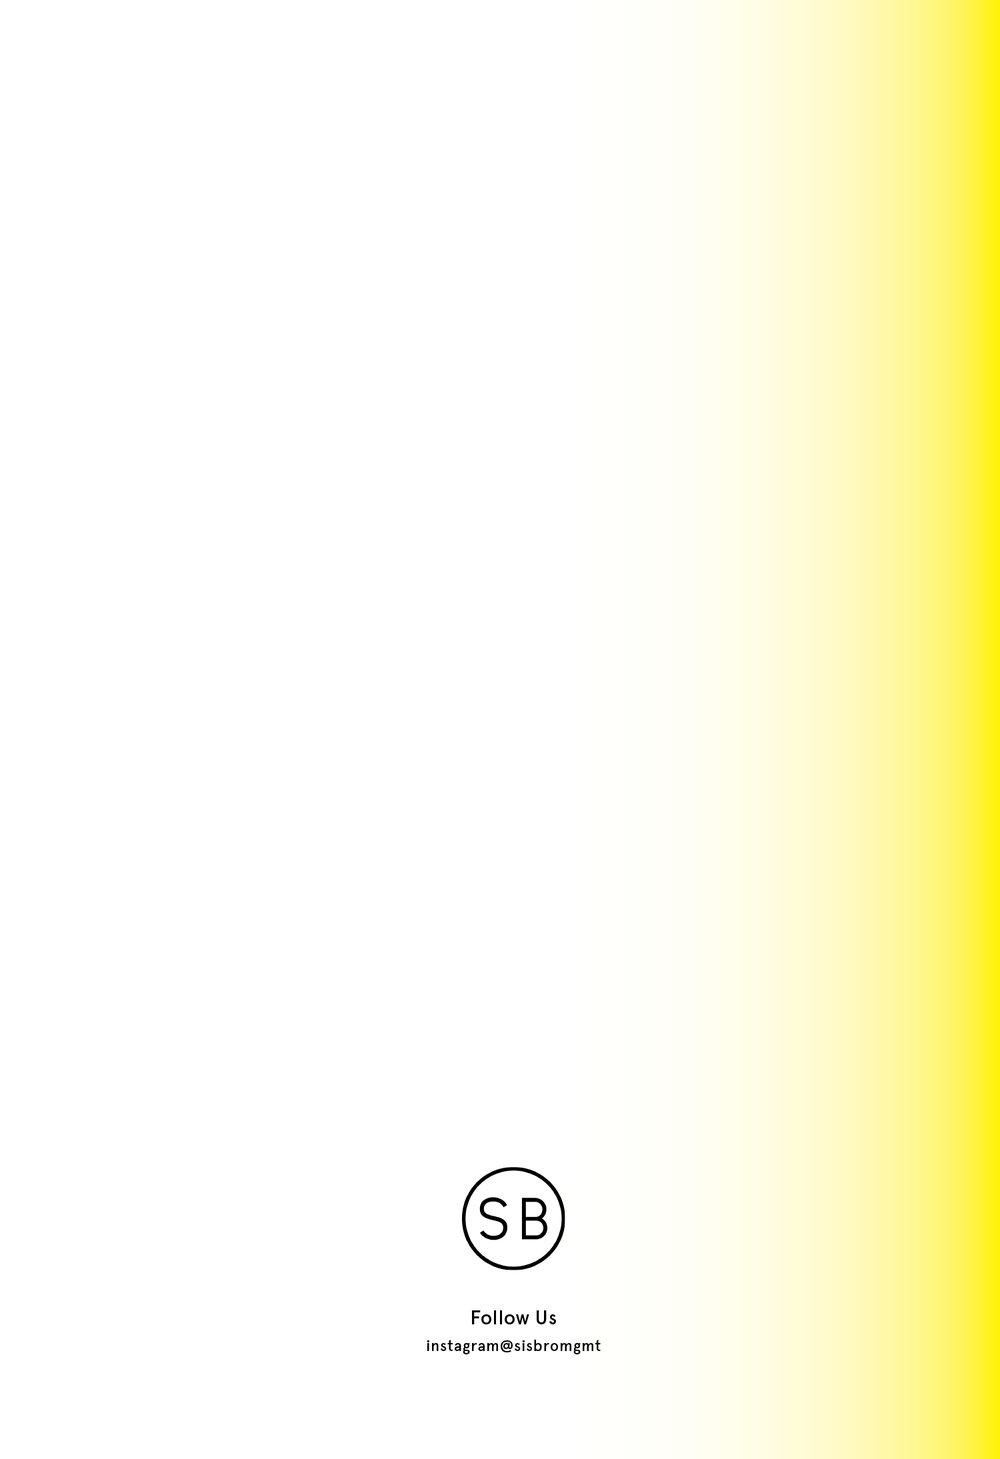 sb-2017-annual-033.jpg